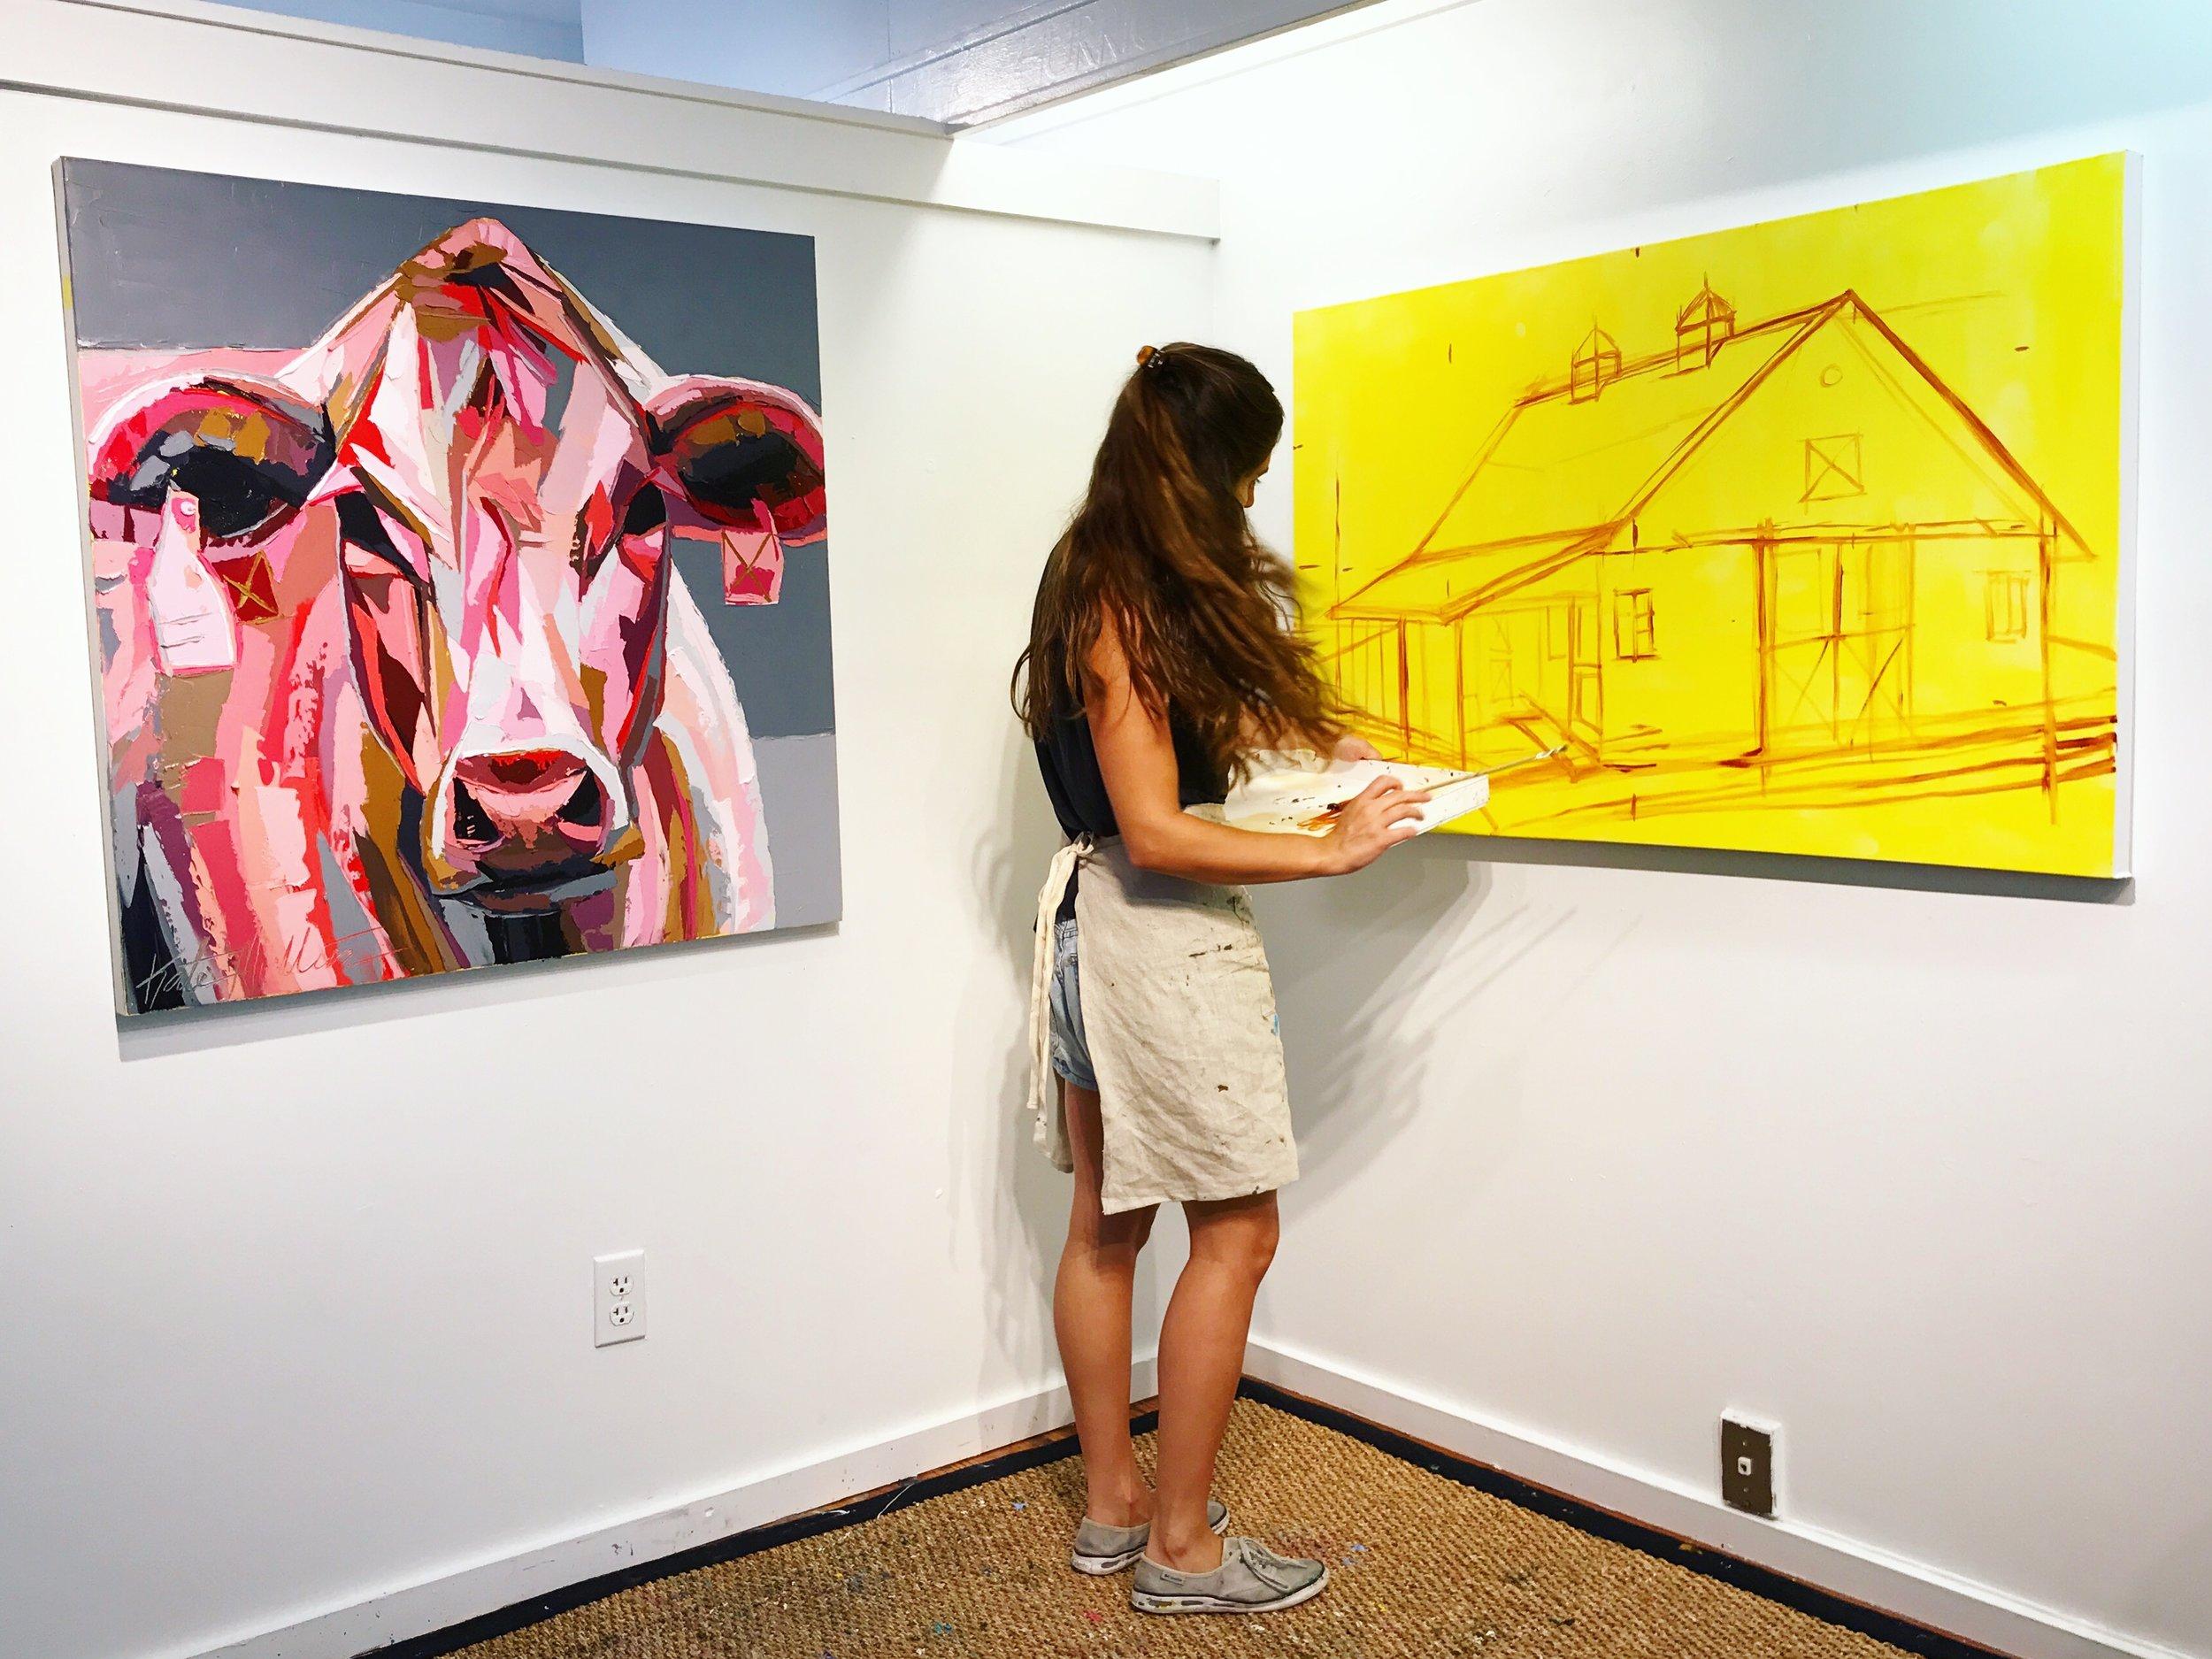 Barn Cow Kate Mullin Williford